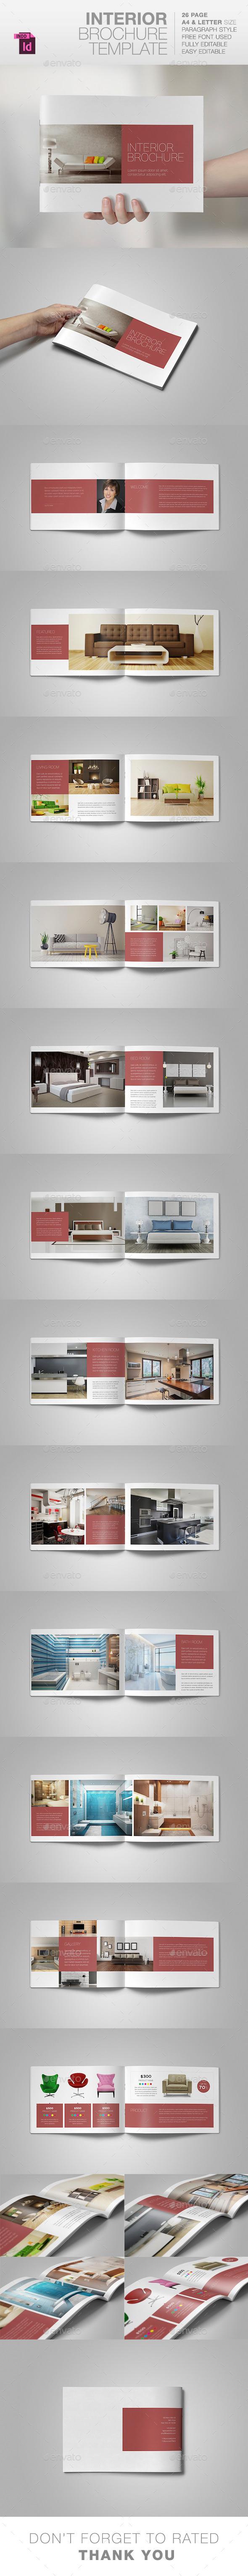 Interior Brochure Template - Brochures Print Templates